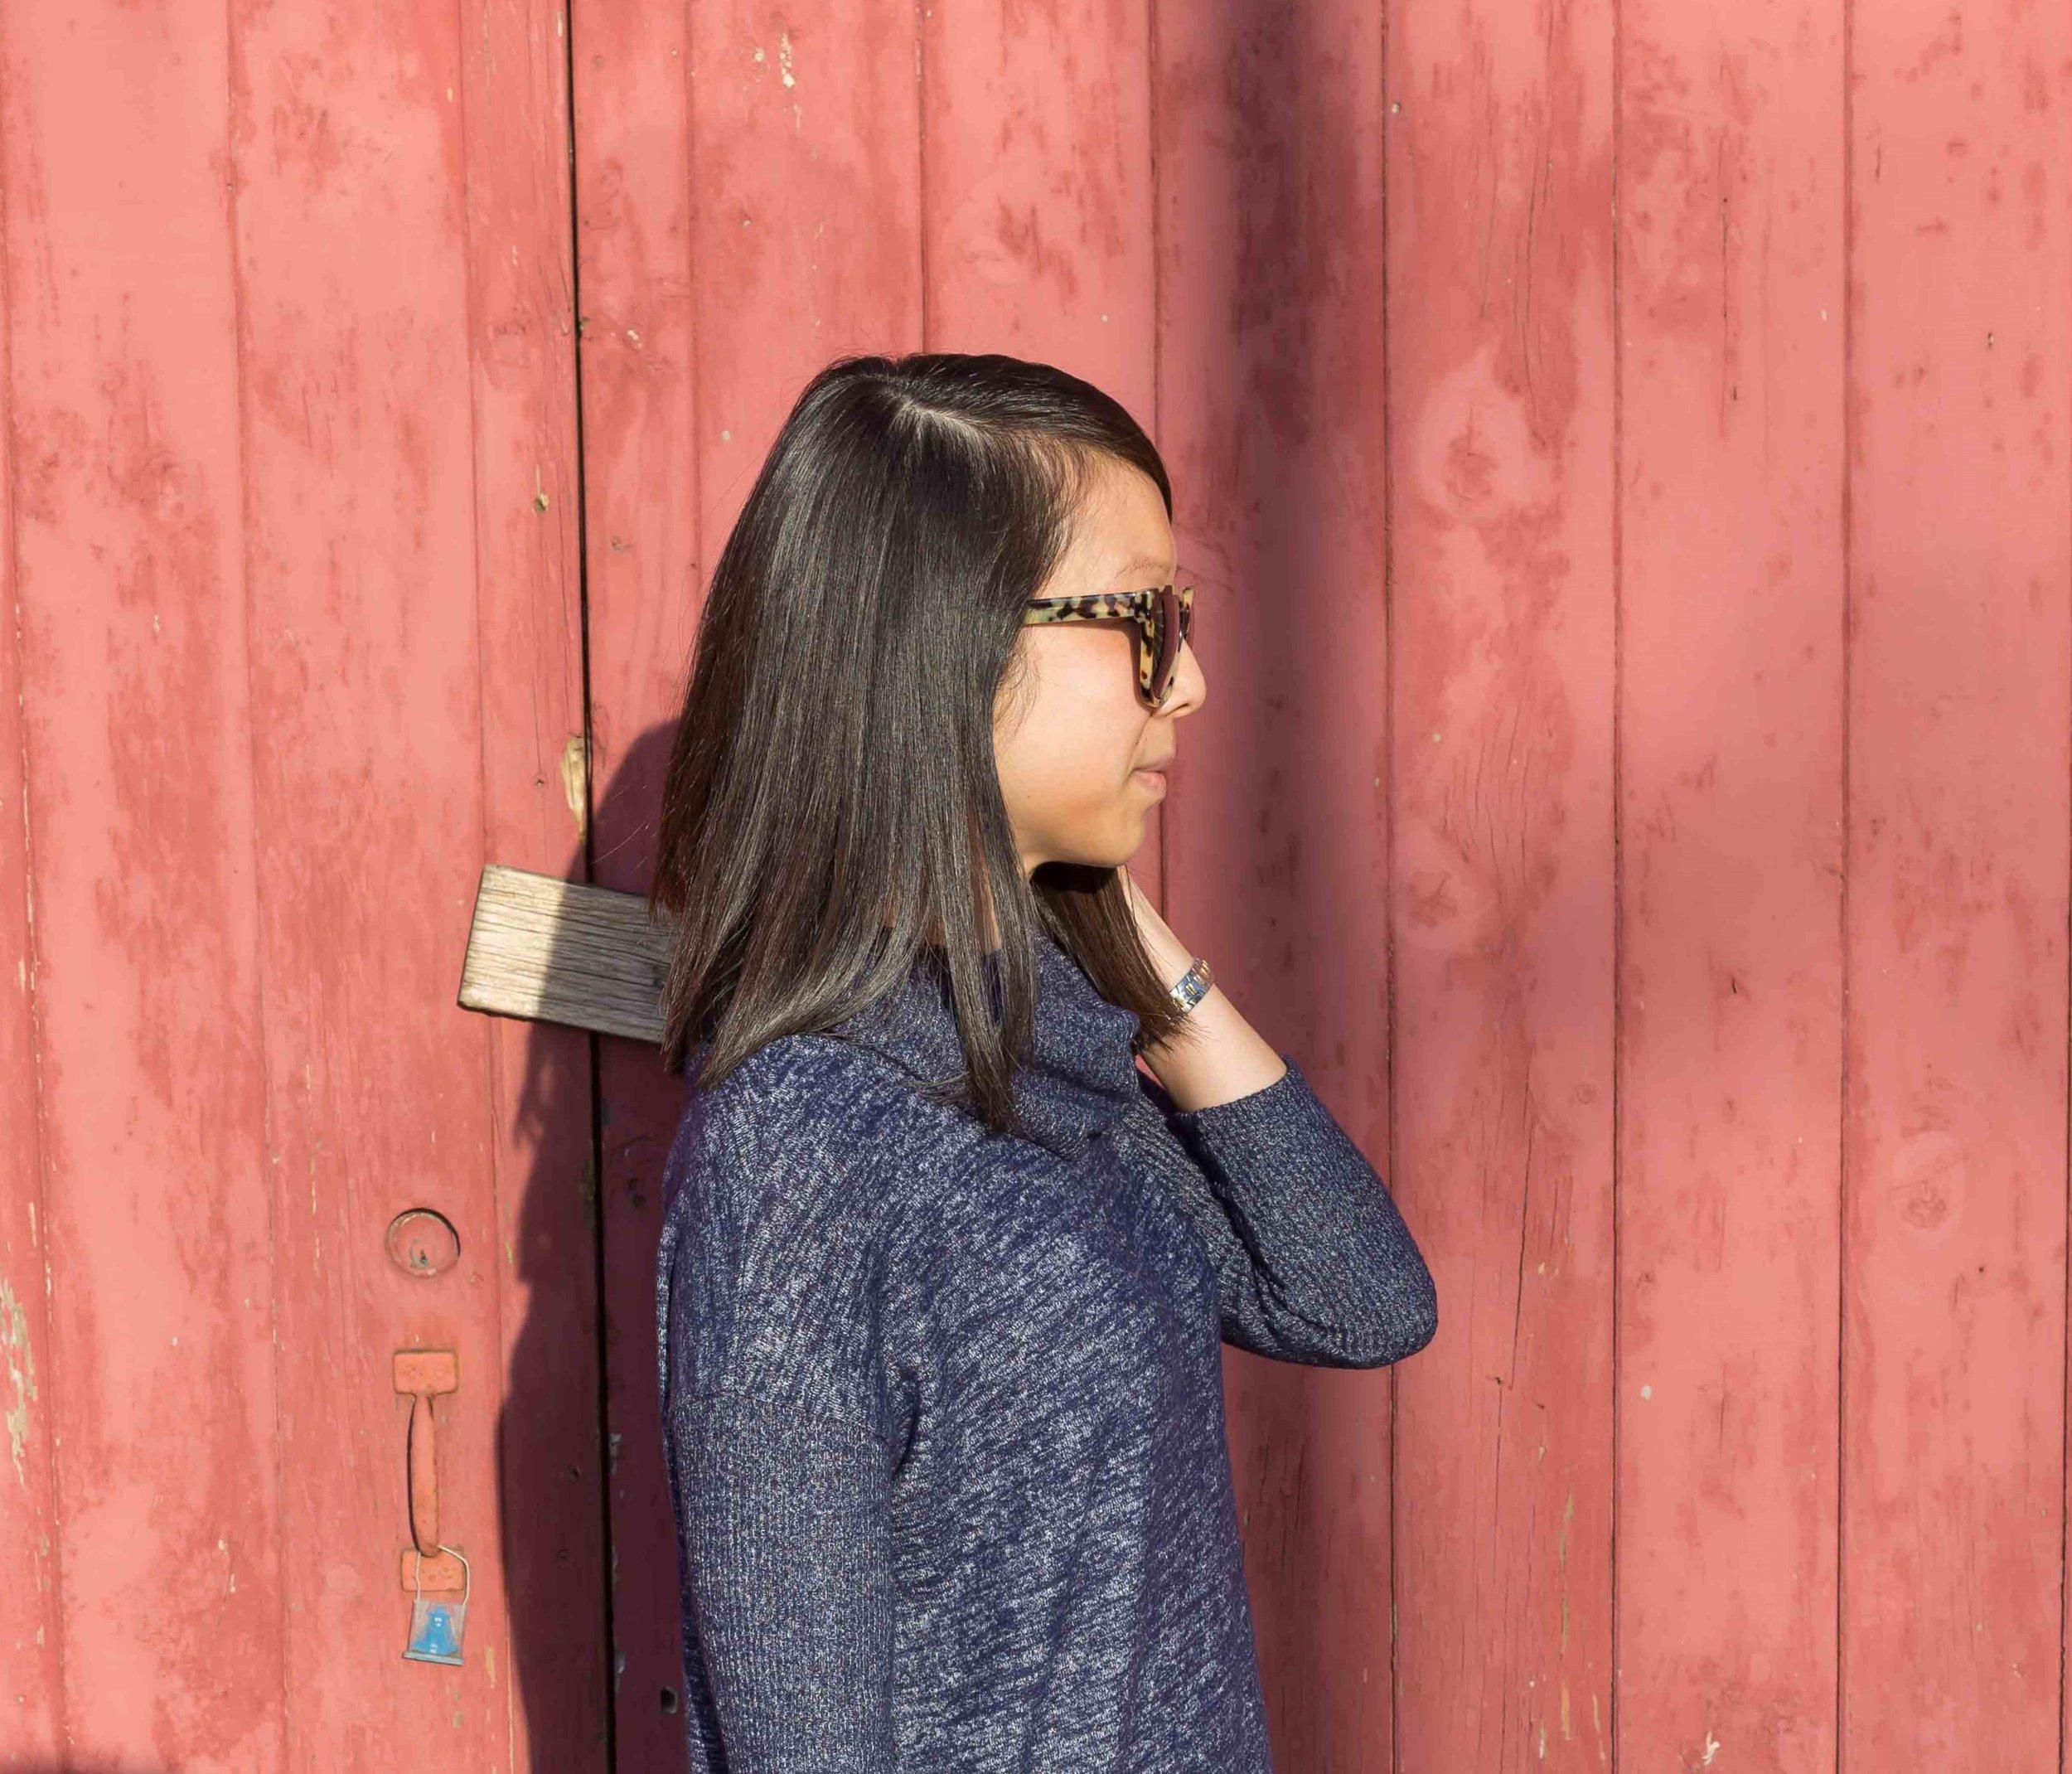 Warby-Parker_Gap-Cowl-Neck-Dress.jpg